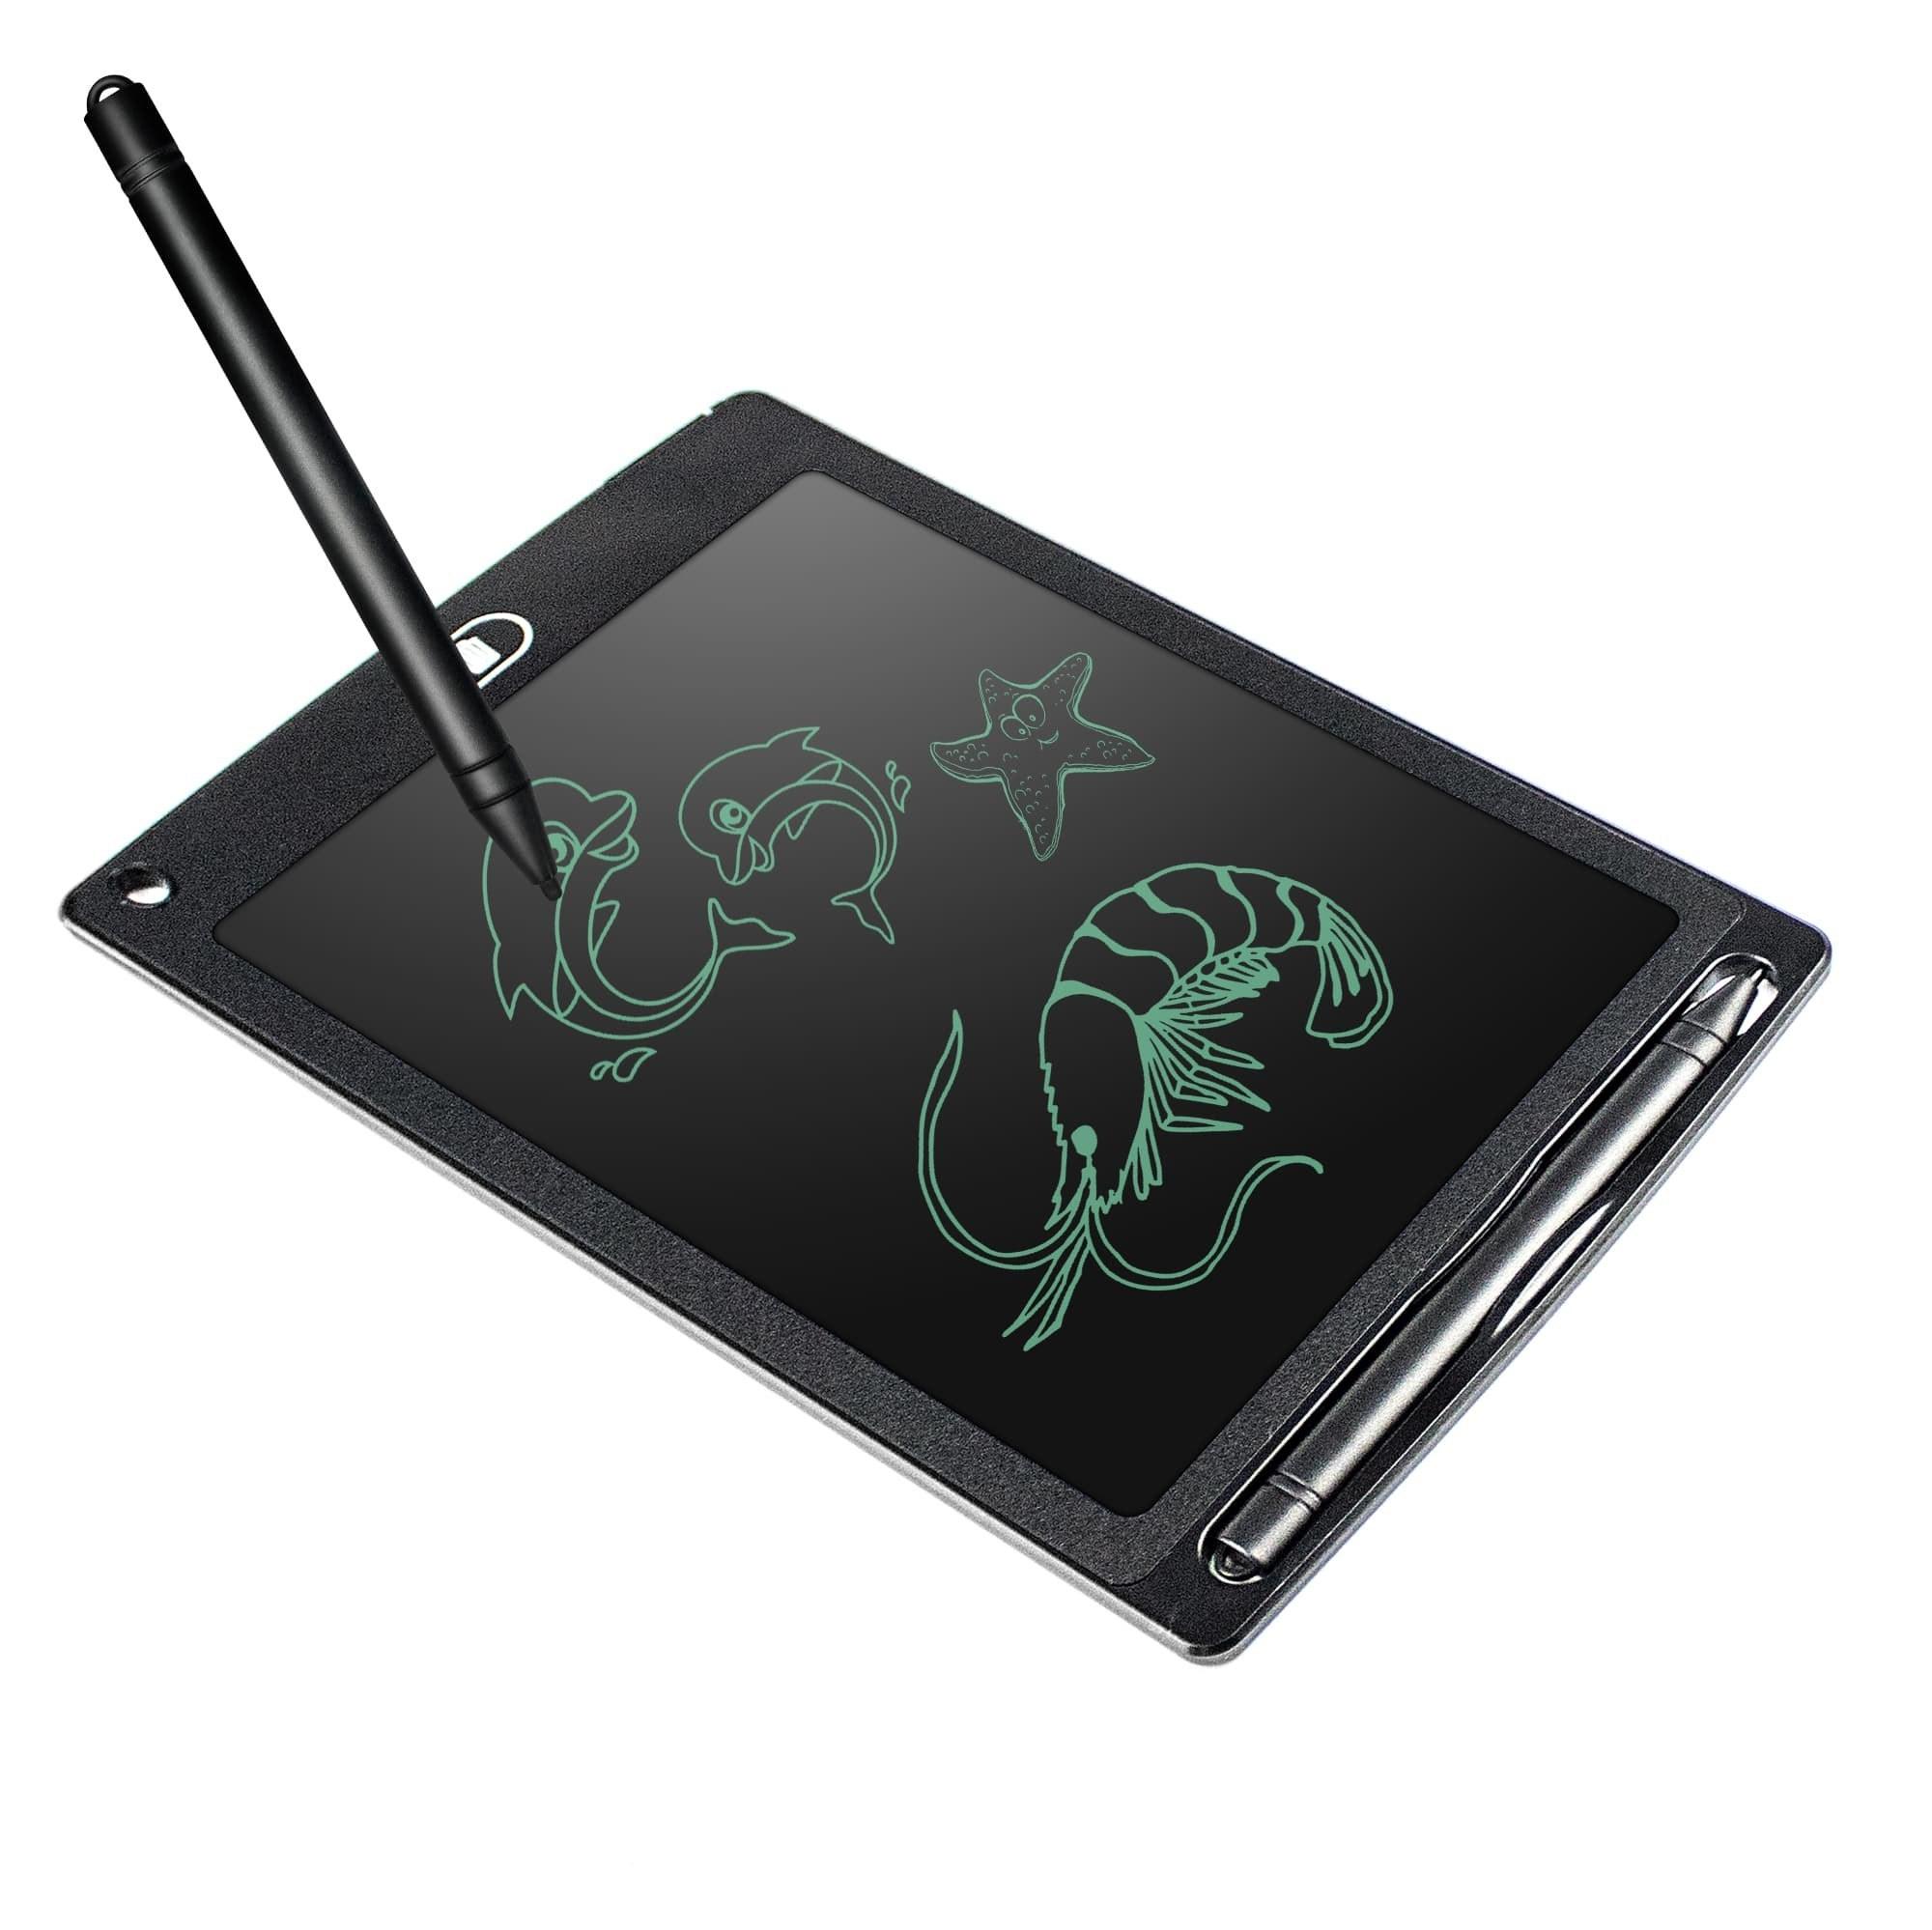 تصویر کاغذ دیجیتالی LCD Writing Tablet Bl LCD Writing Tablet Bl